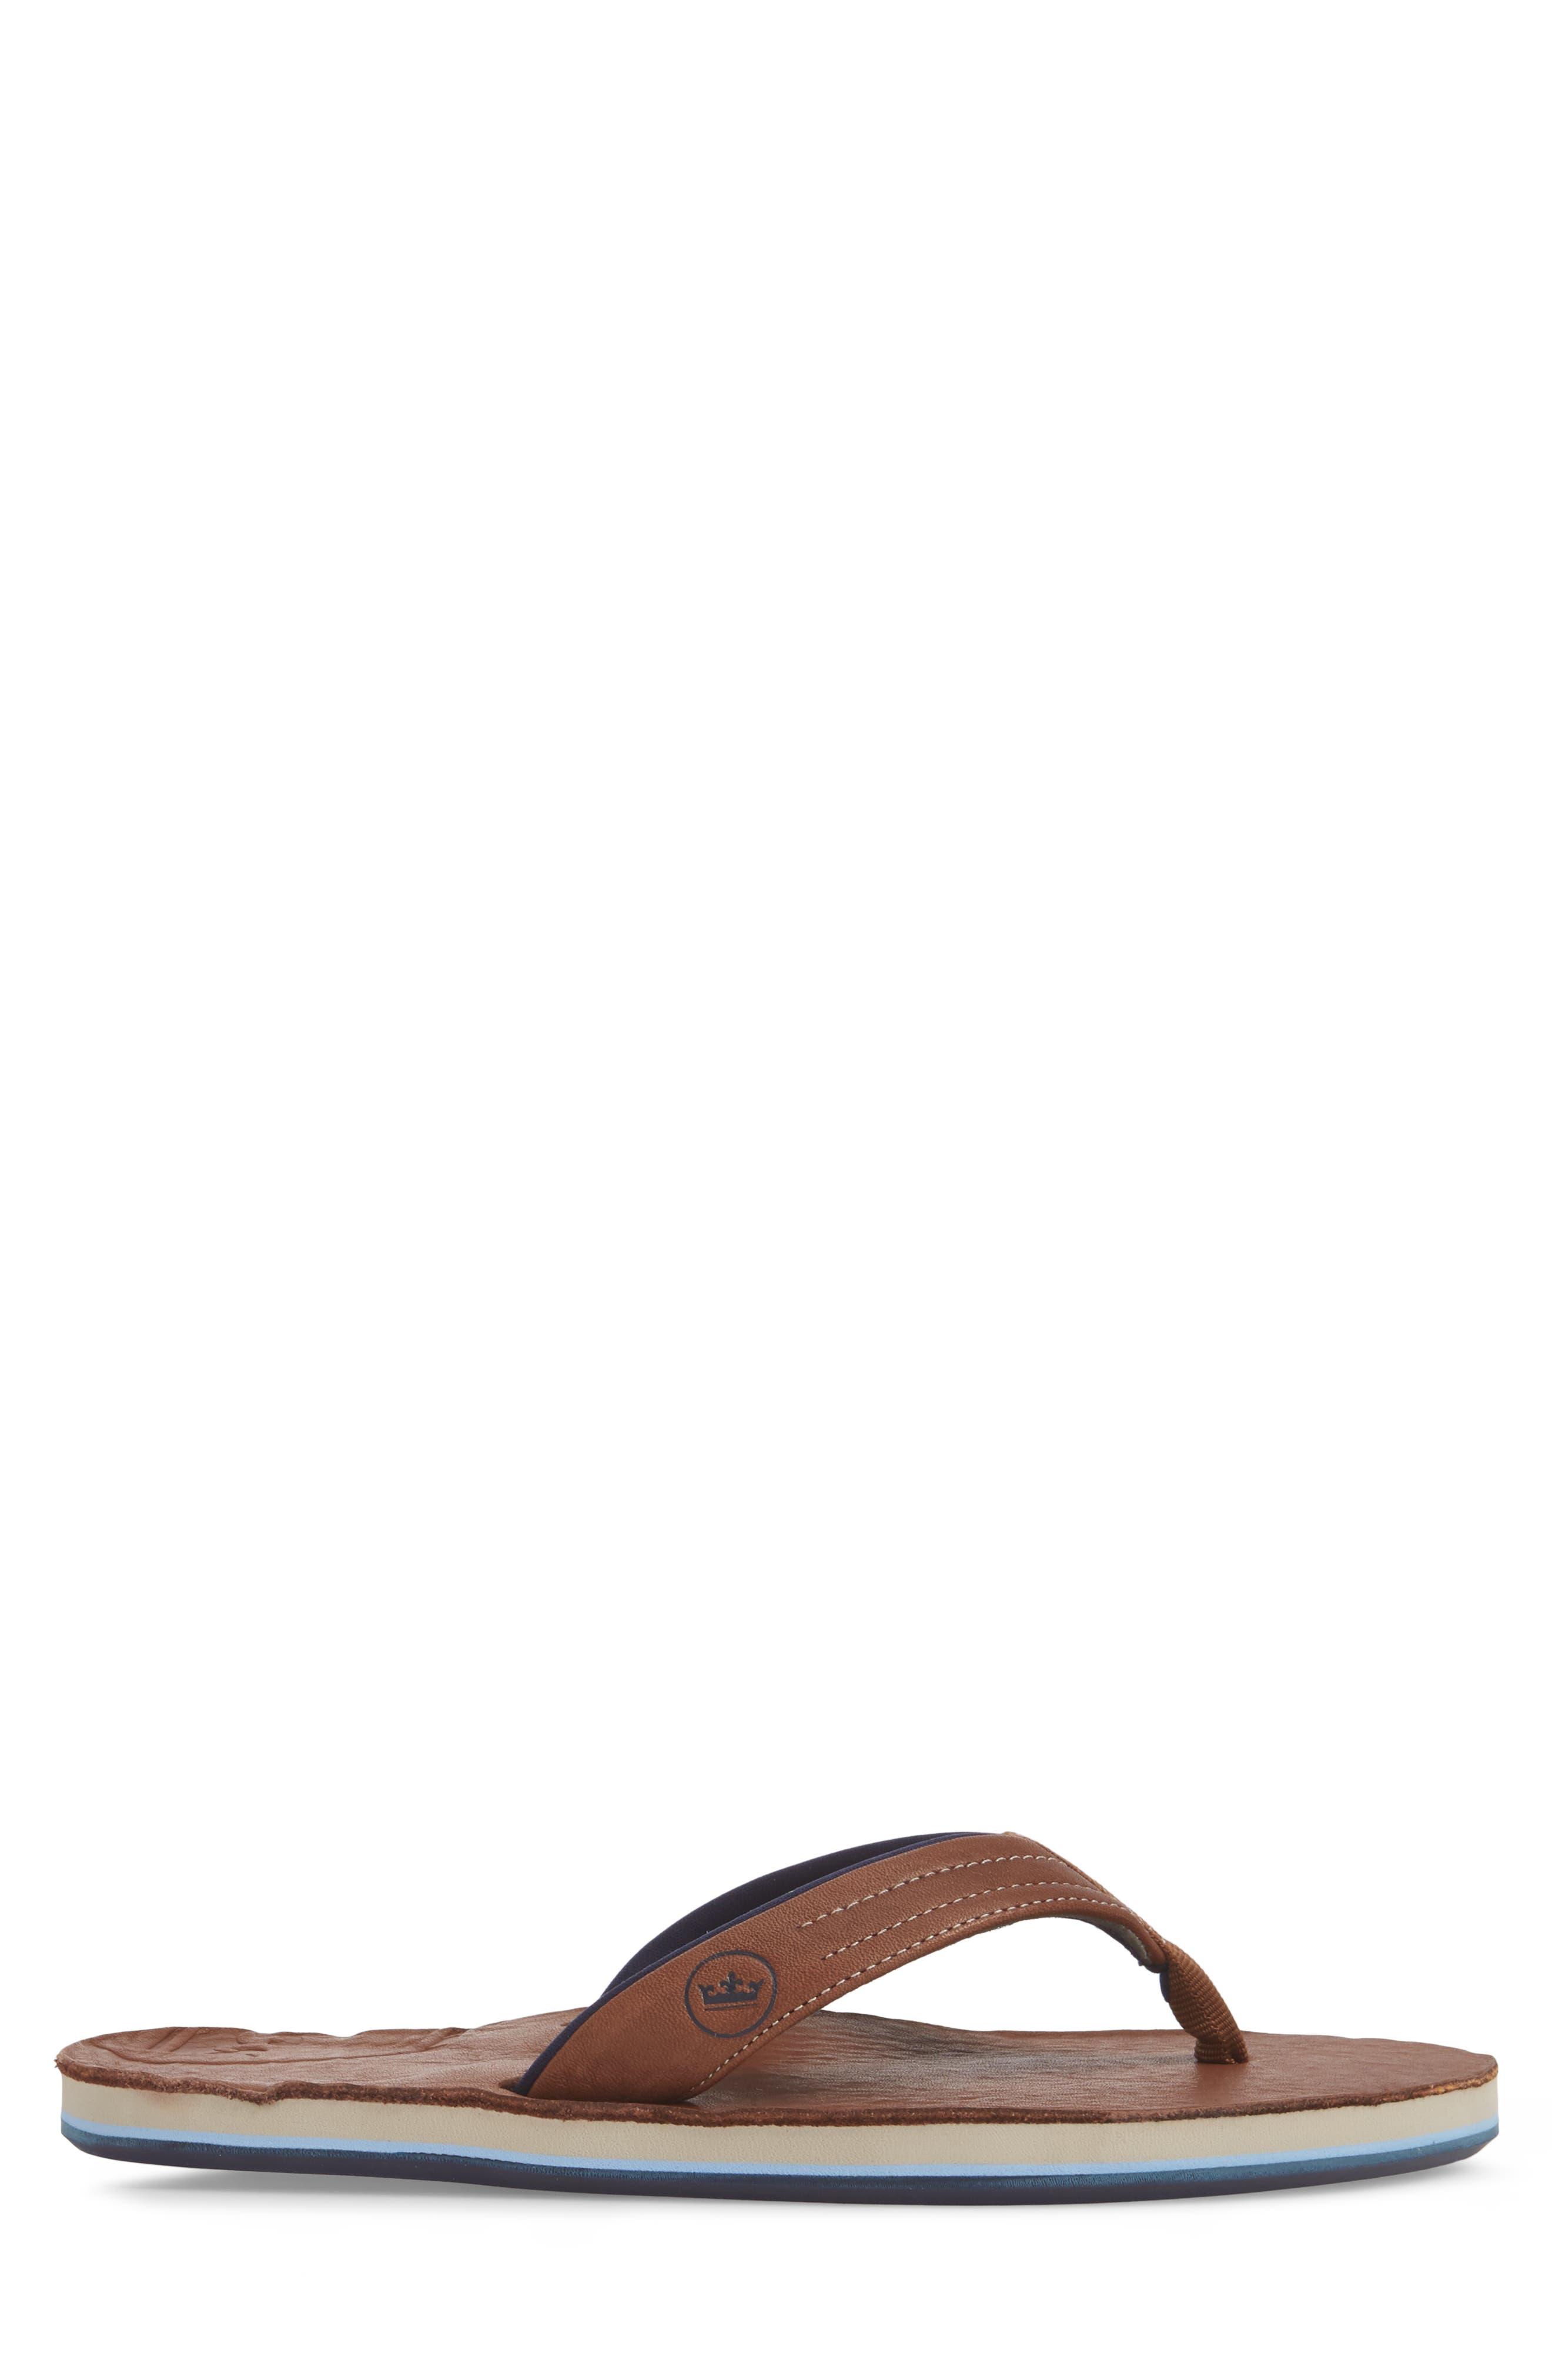 x Peter Millar Leather Flip Flop,                             Alternate thumbnail 3, color,                             Dark Chocolate Leather